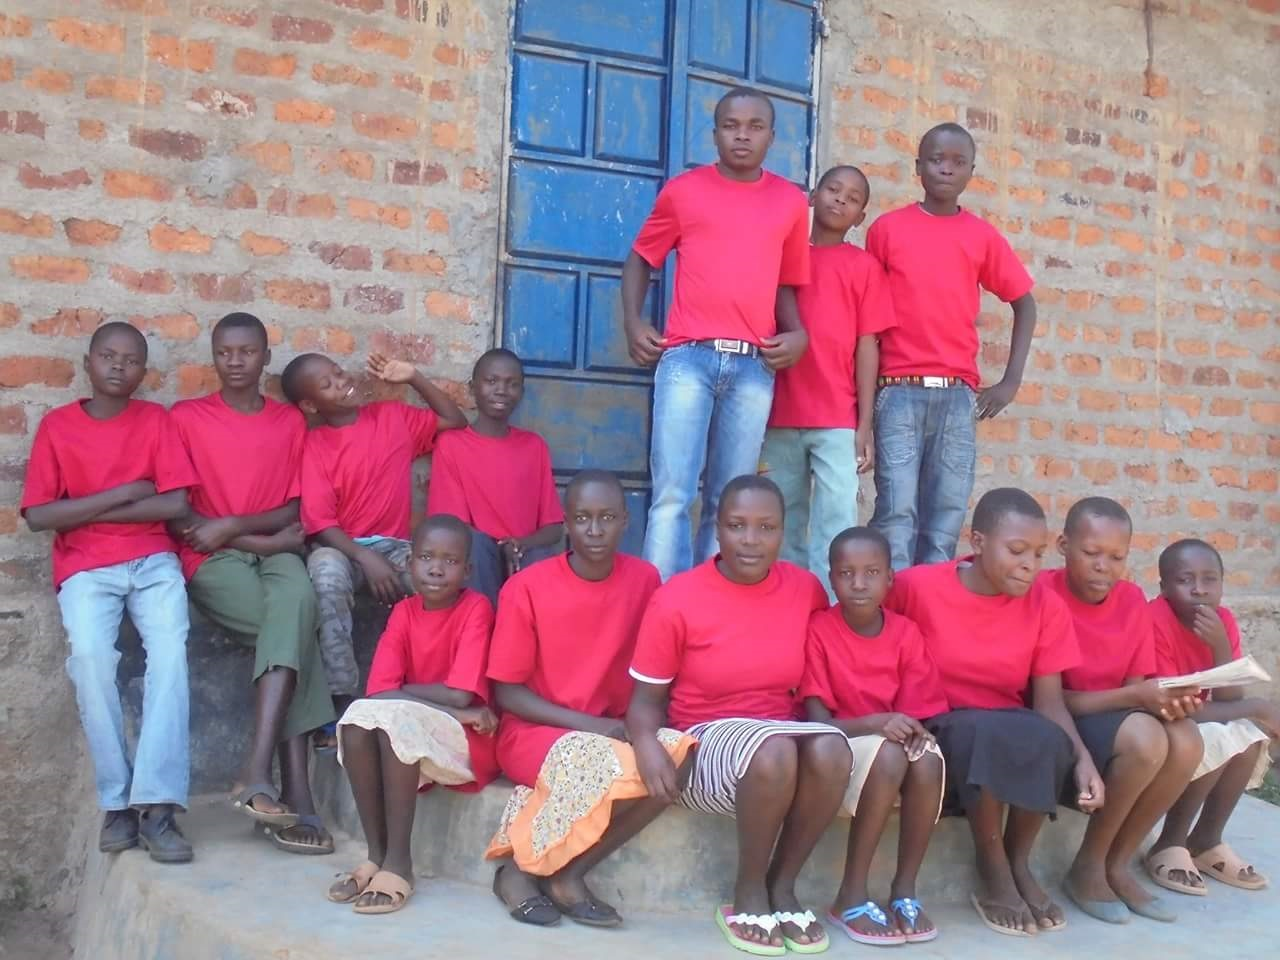 Kenya red shirts.jpg